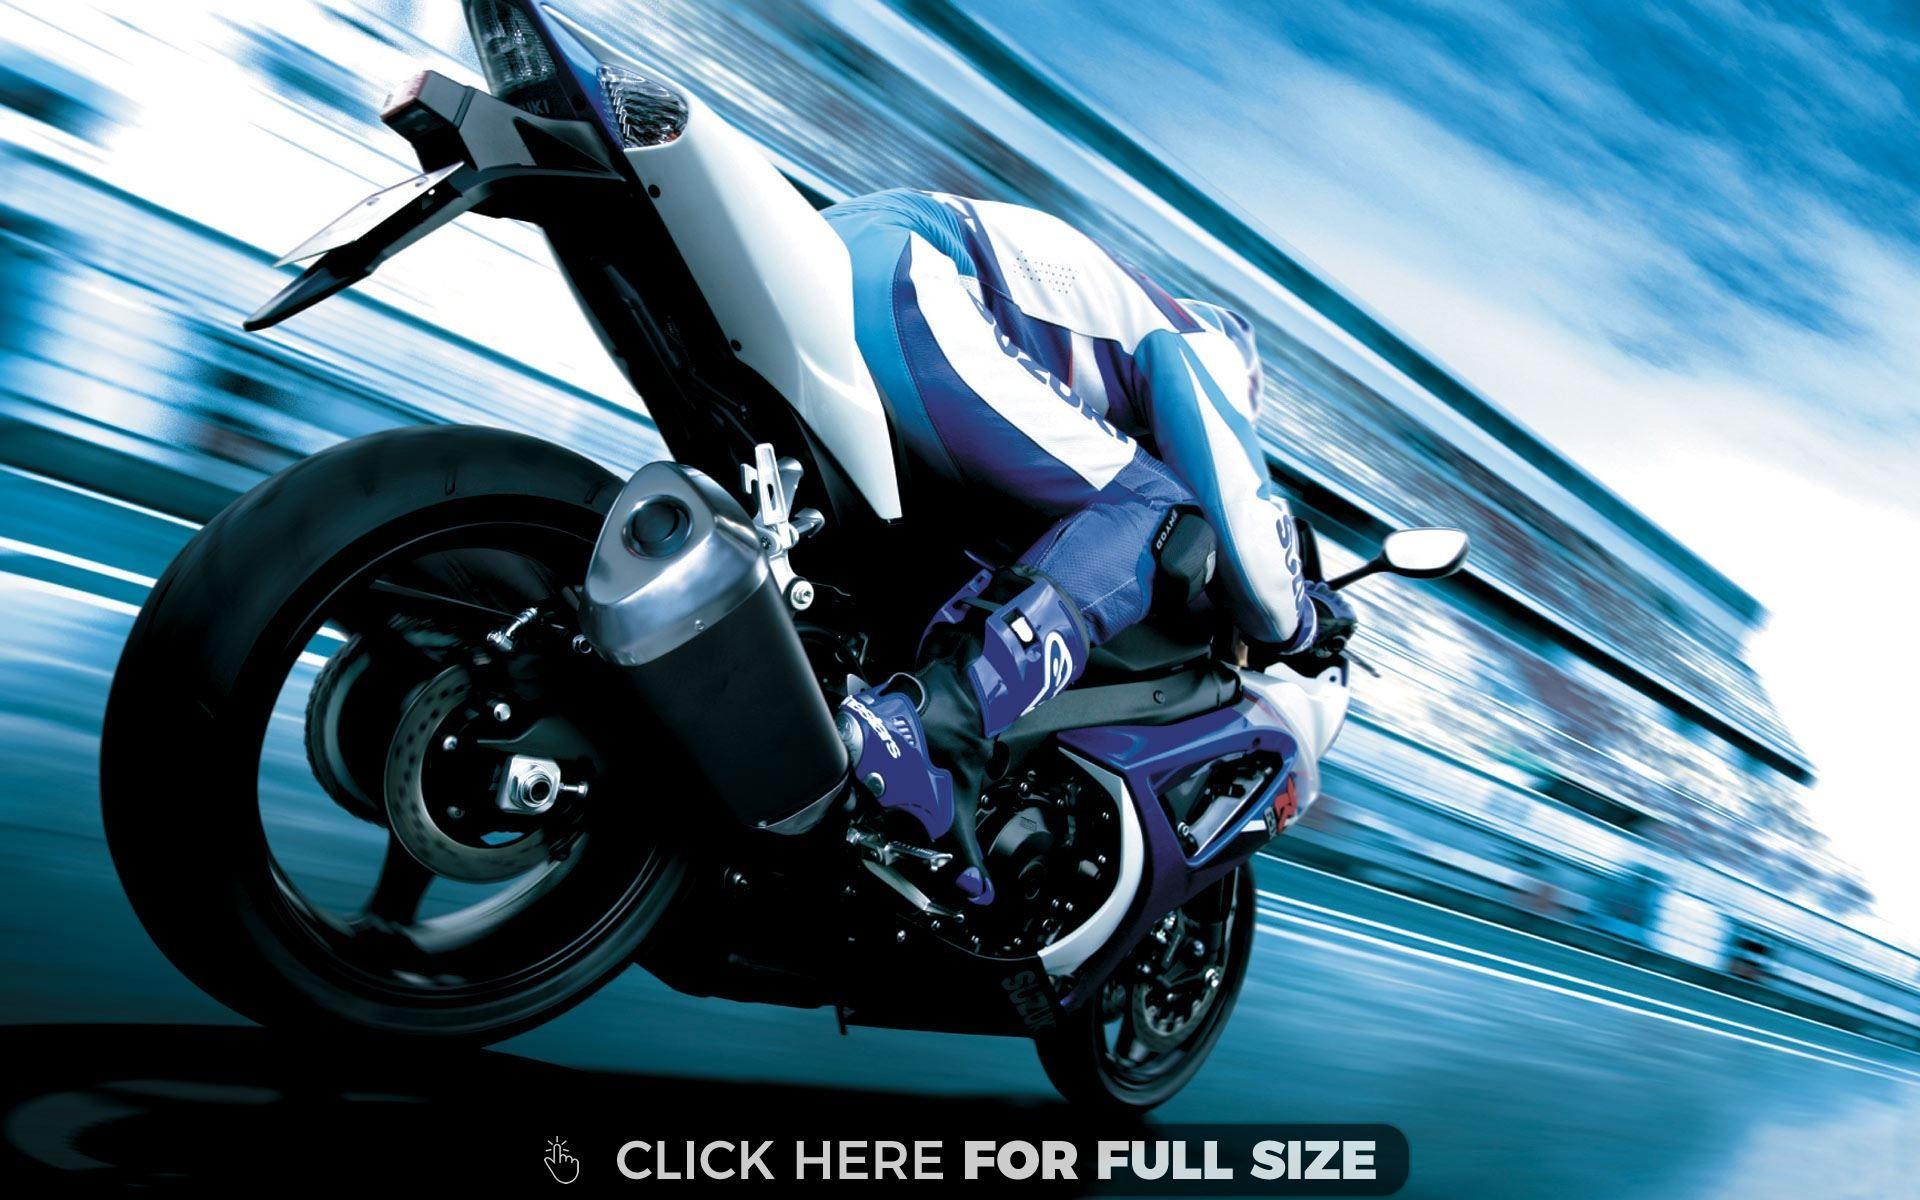 Great Motorcycle And Super Bikes Heavy Bikes S 16 Racing Bikes